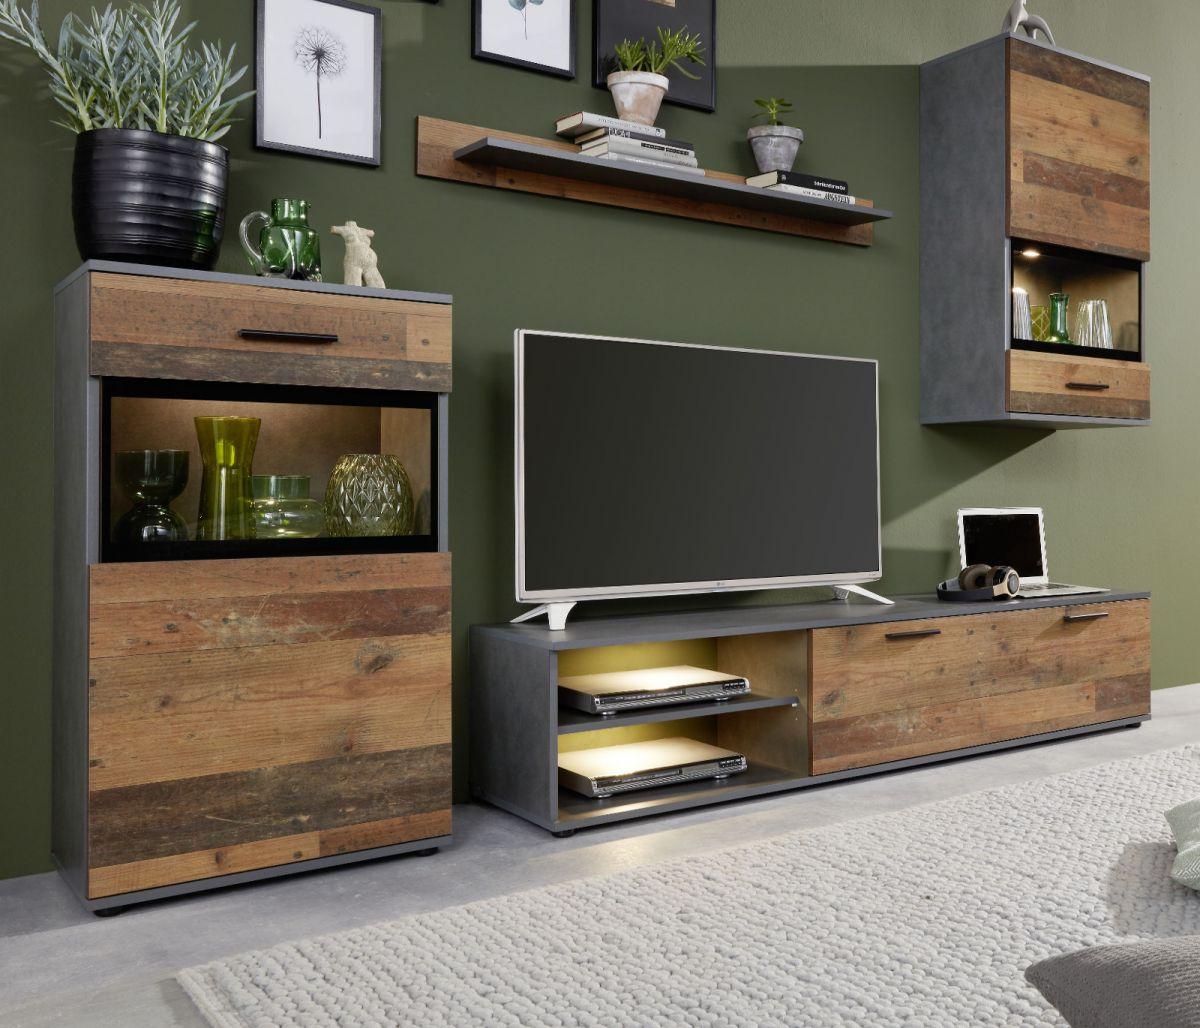 Wohnwand Mango in Used Wood Shabby und Matera grau 246 cm